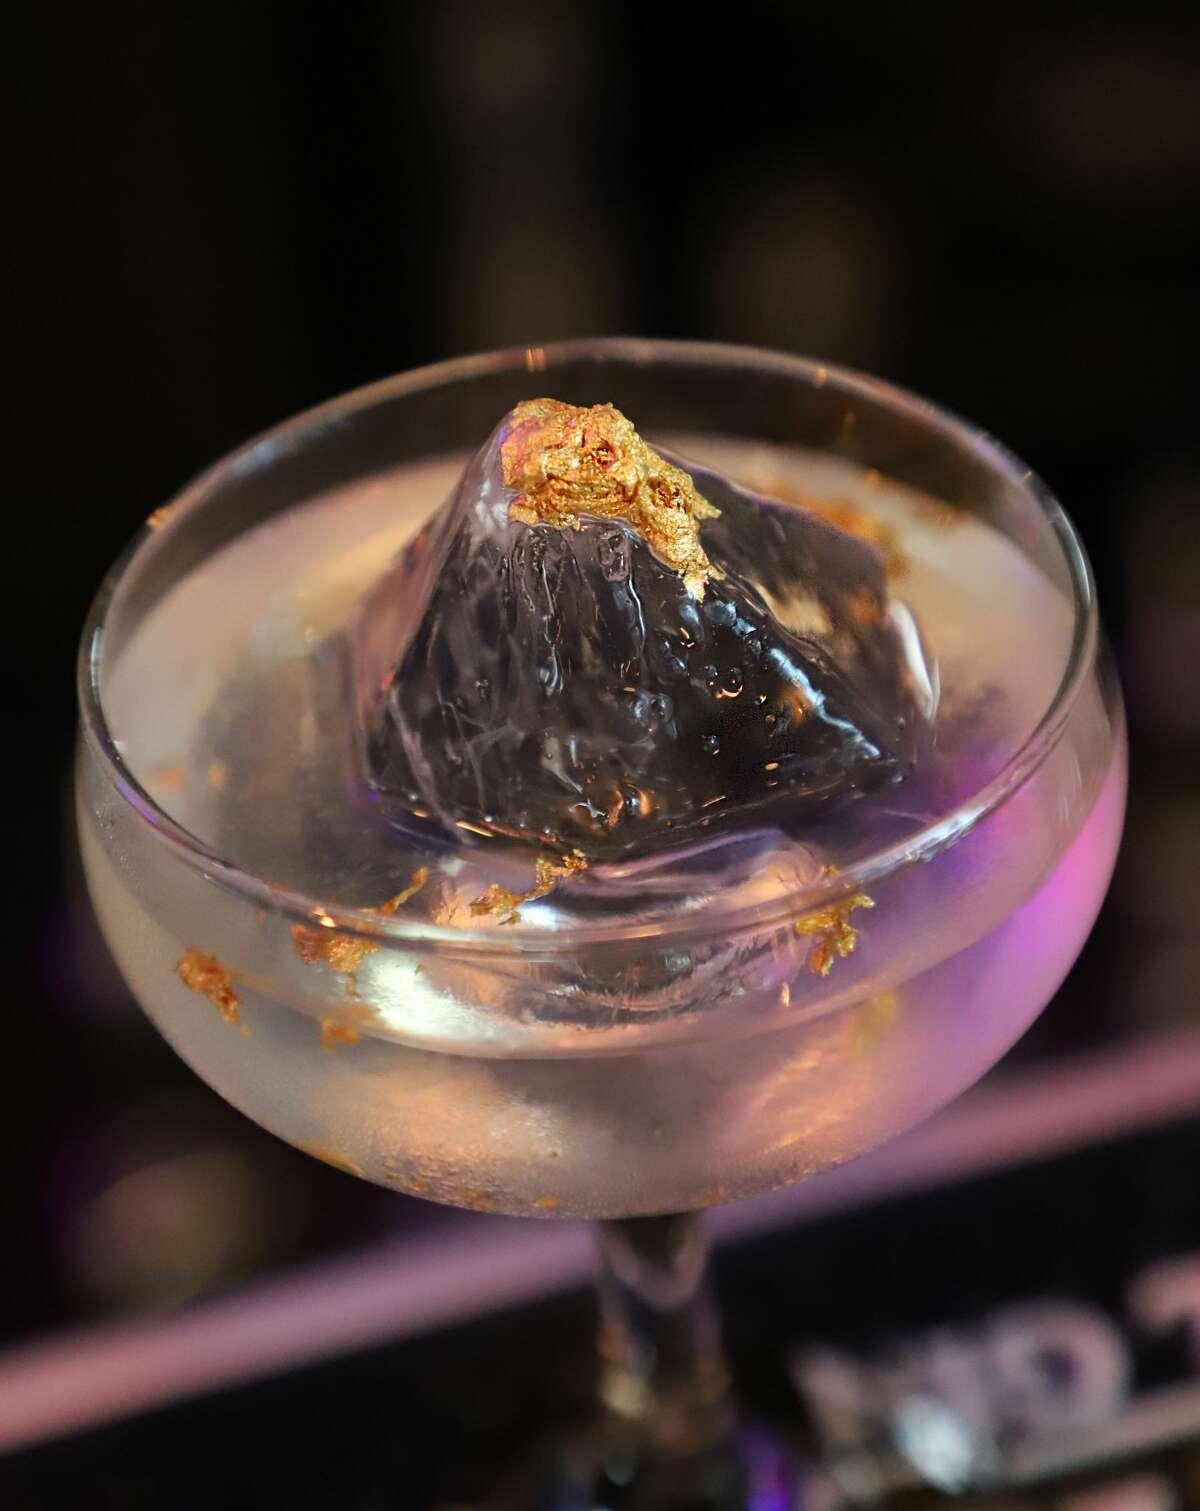 RHK's Diamond and Gold Negroni cocktail, with 24-karat gold flakes